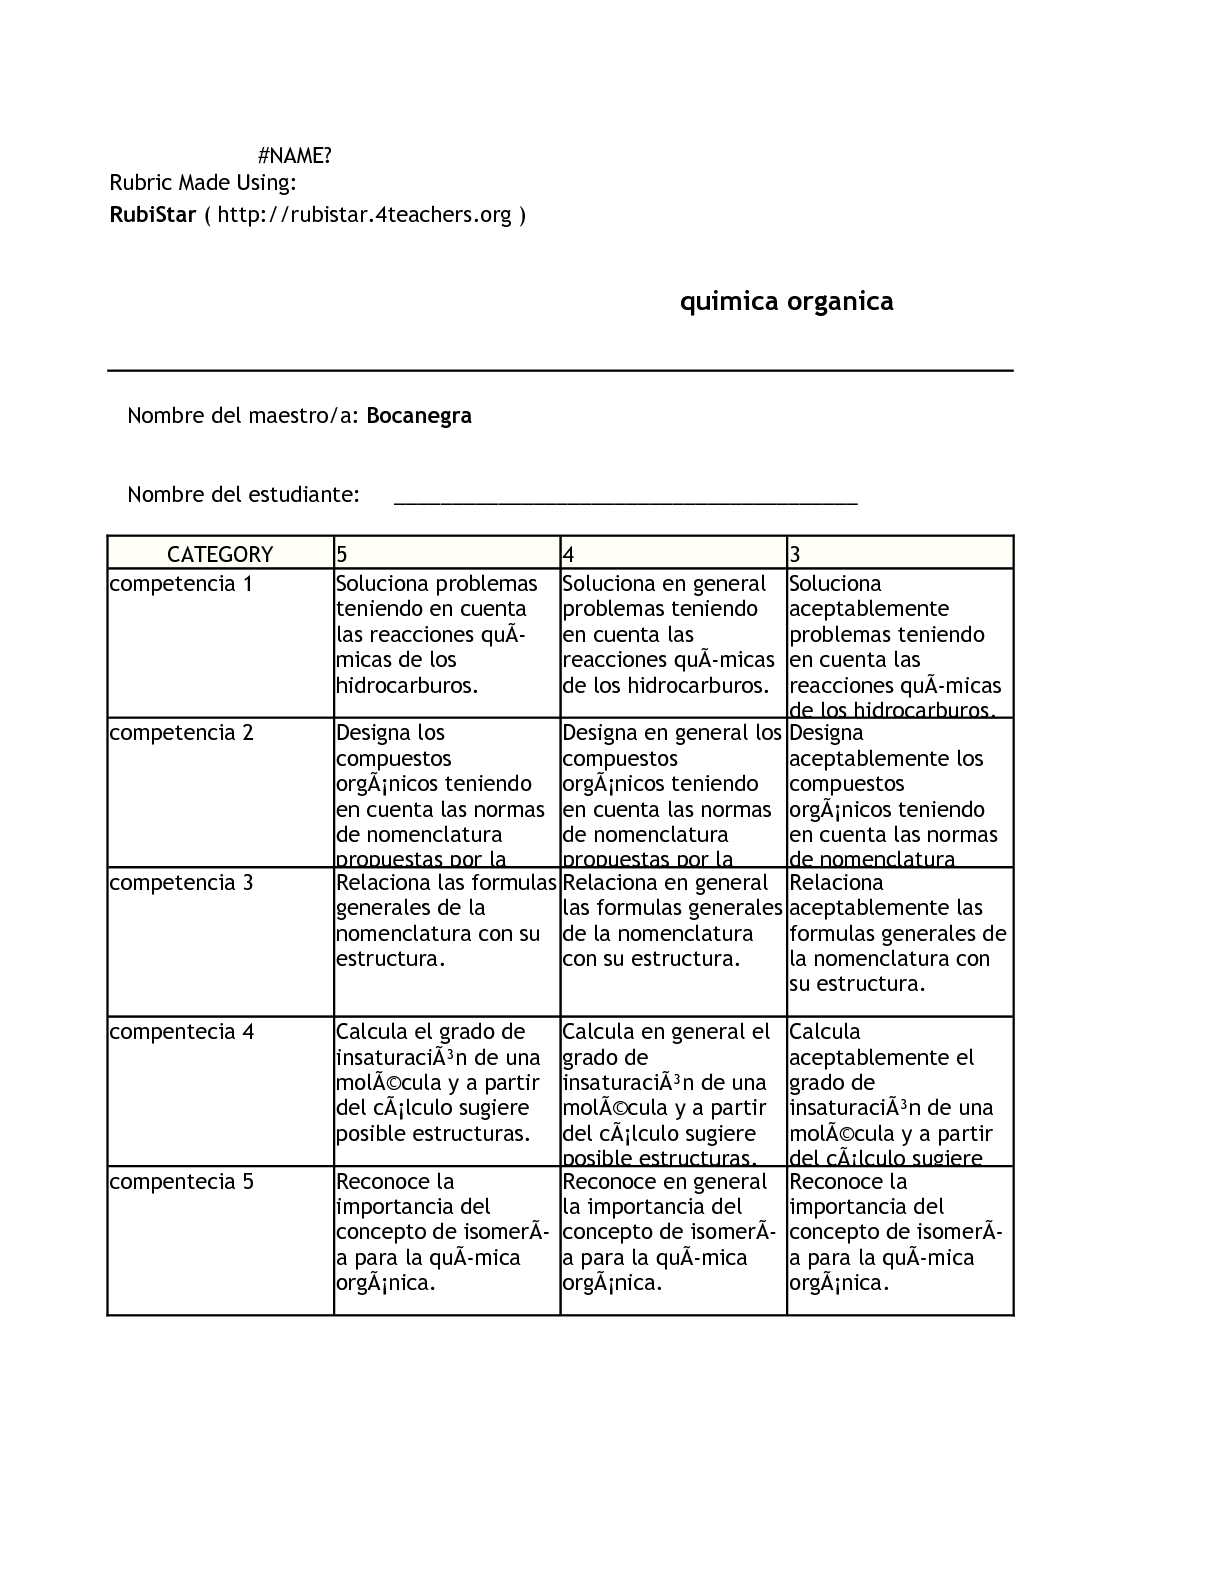 Rubrica Quimica Organica. Folkenberg Bocanegra Aragon